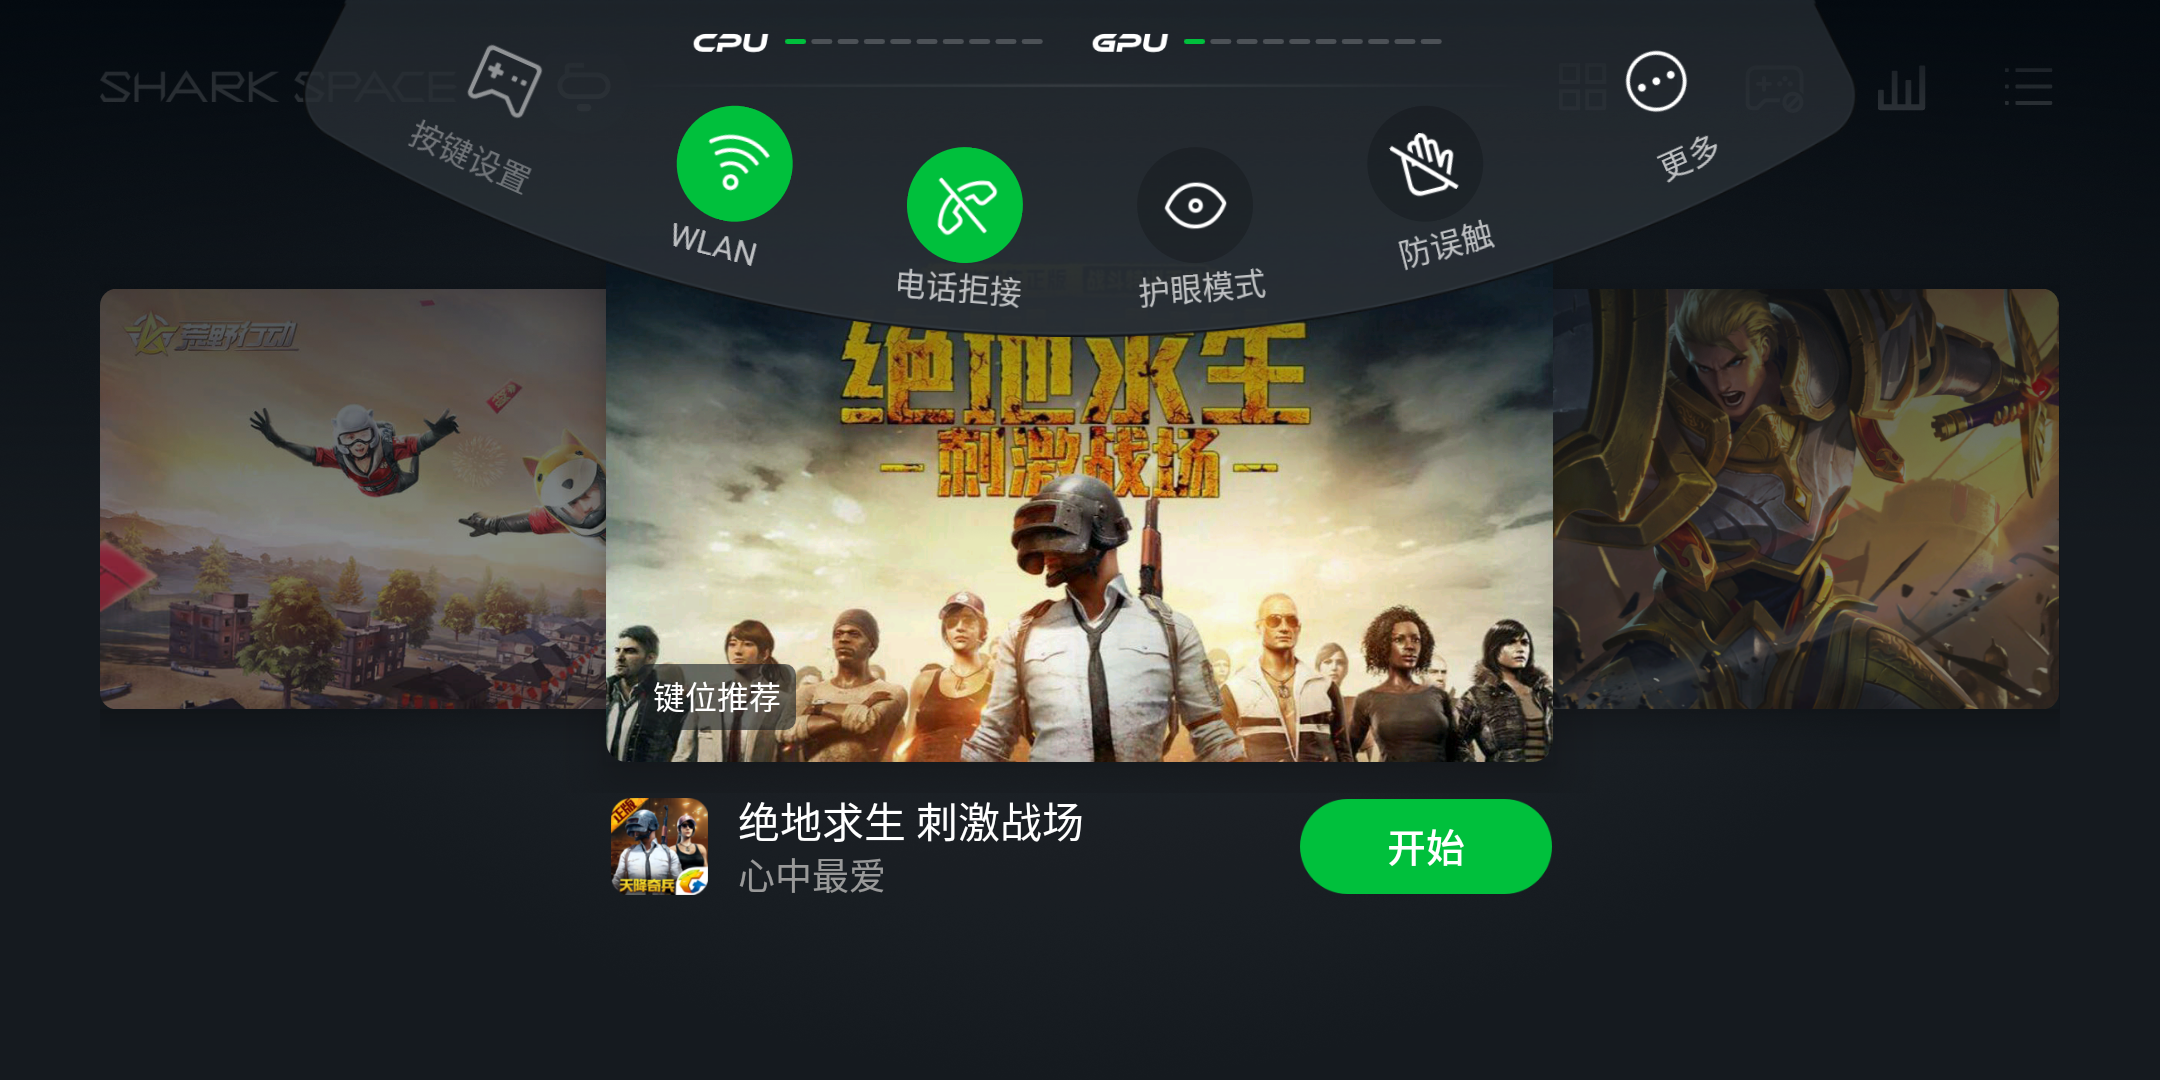 Screenshot_2018-06-01-08-56-21-843_com.blackshark.gamelauncher.png